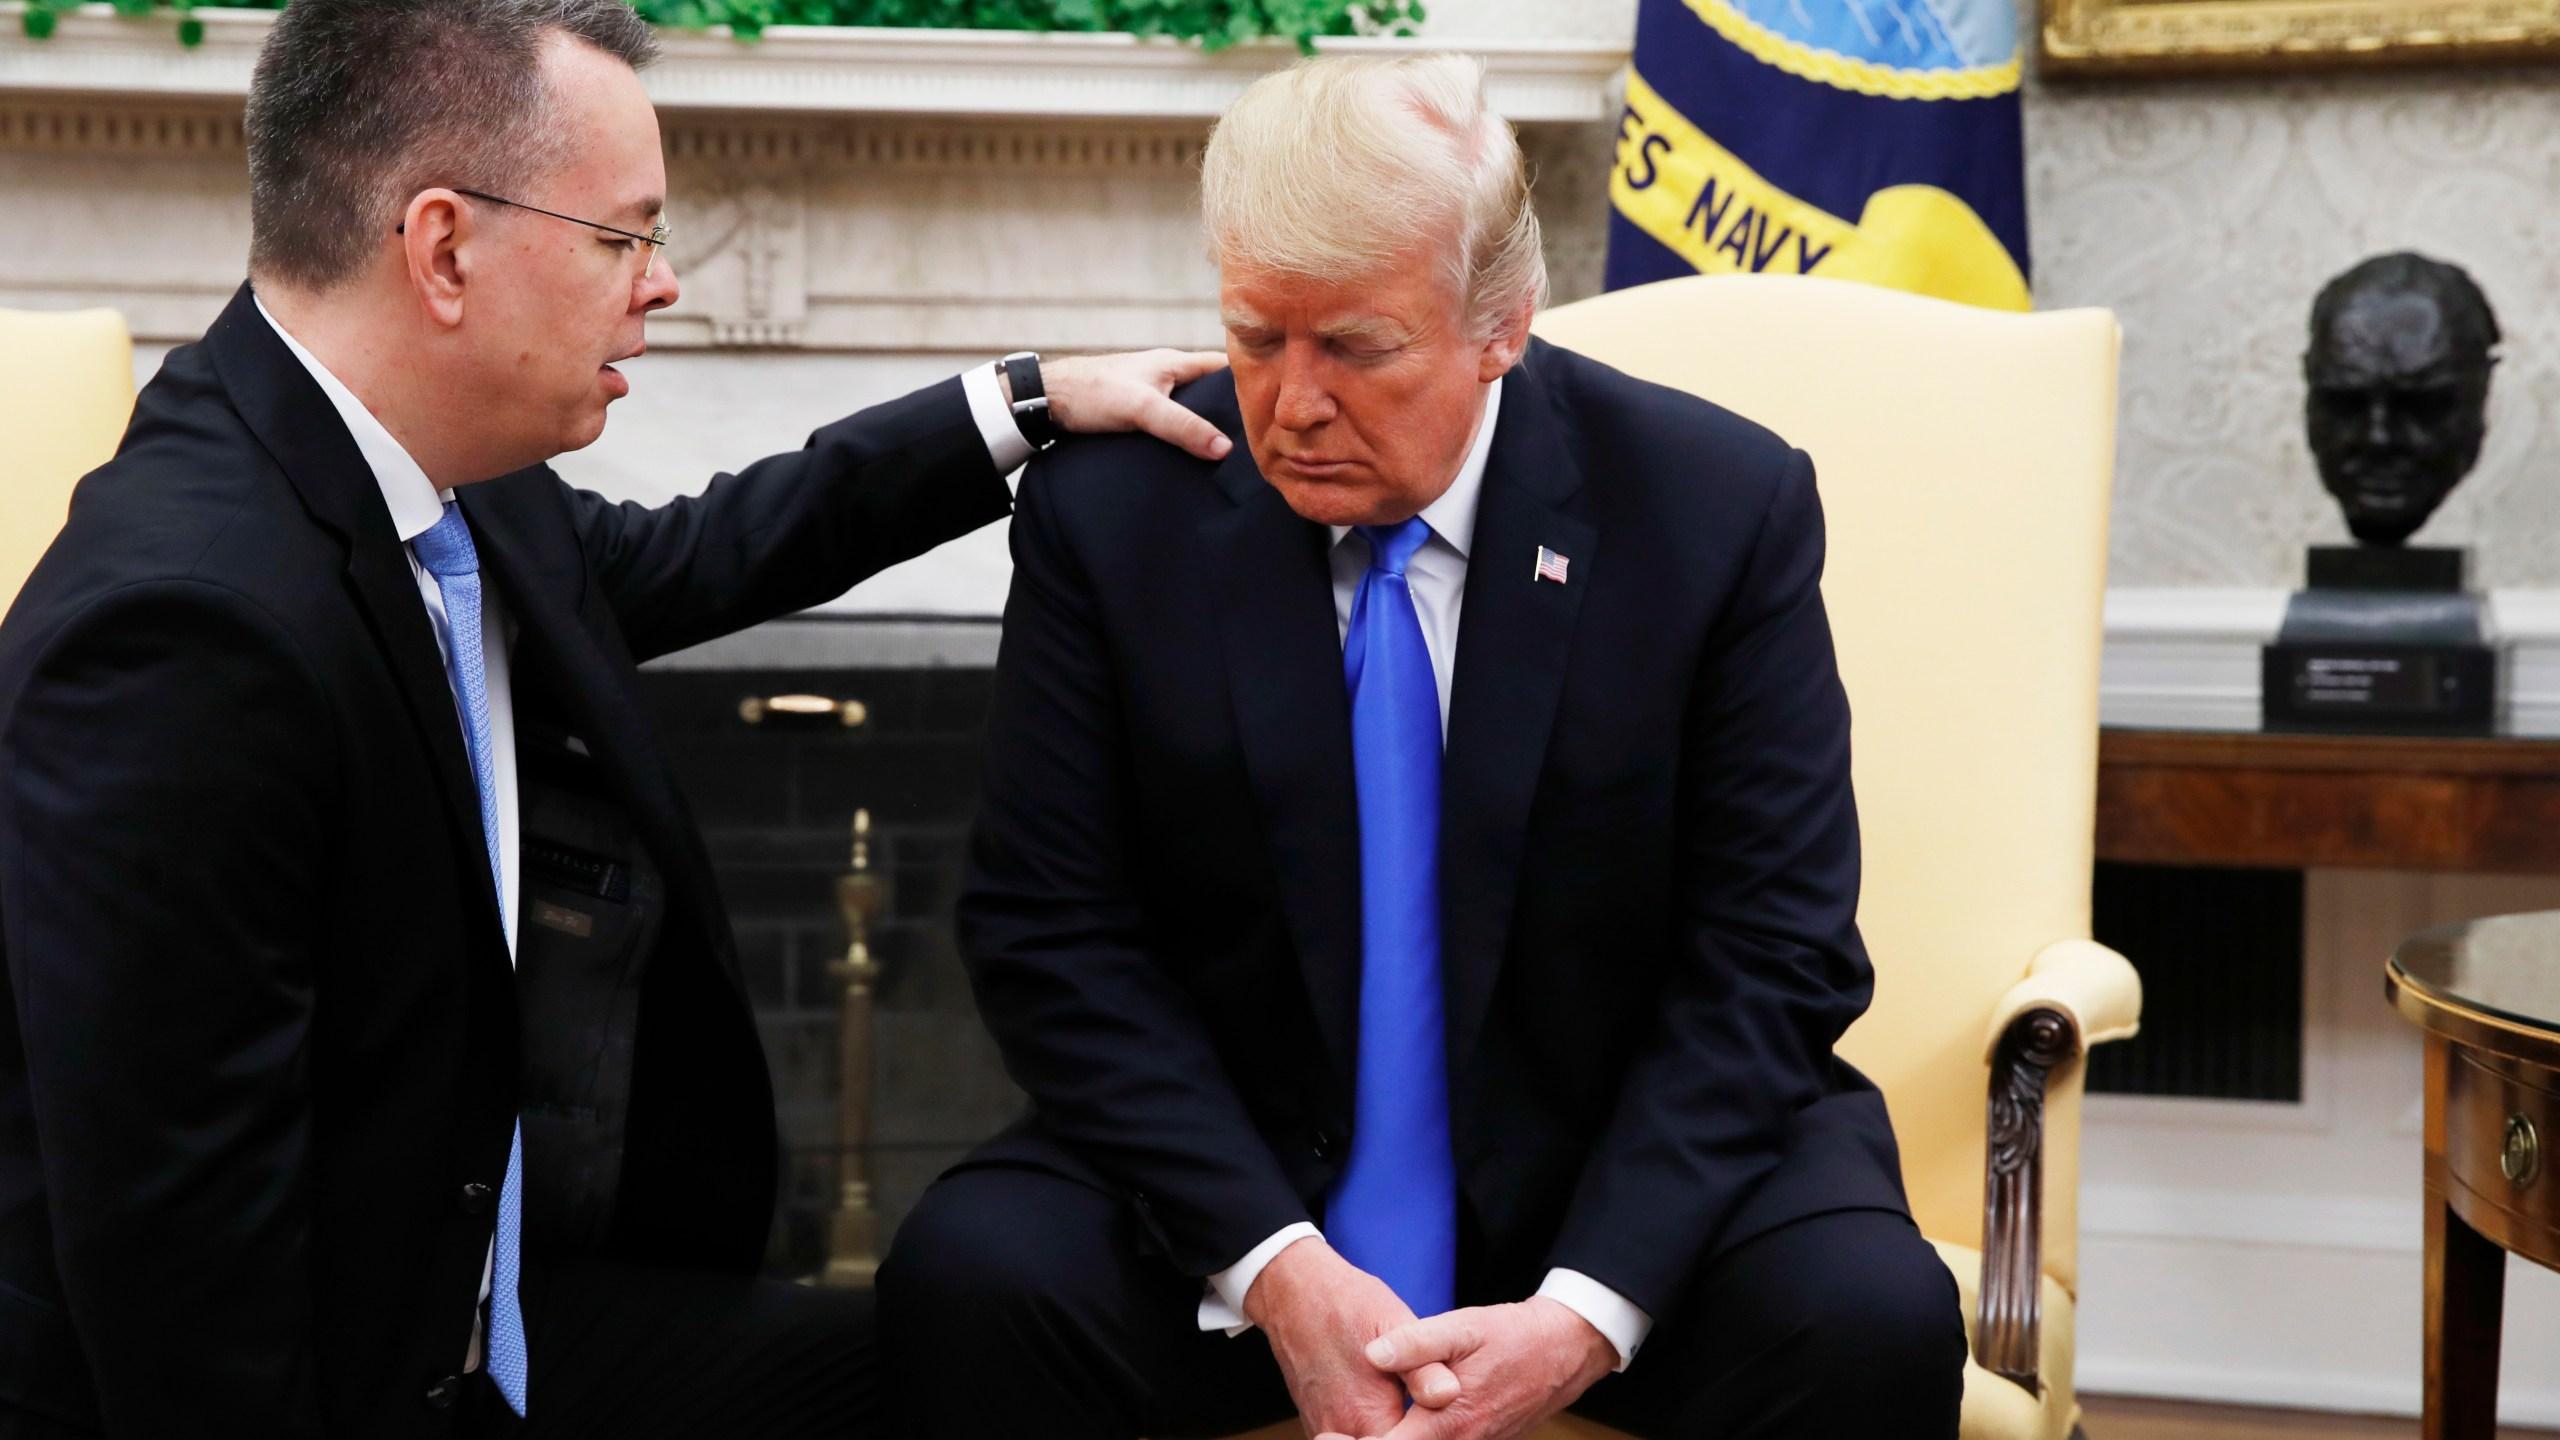 APTOPIX_Trump_American_Pastor_80707-159532.jpg14909426